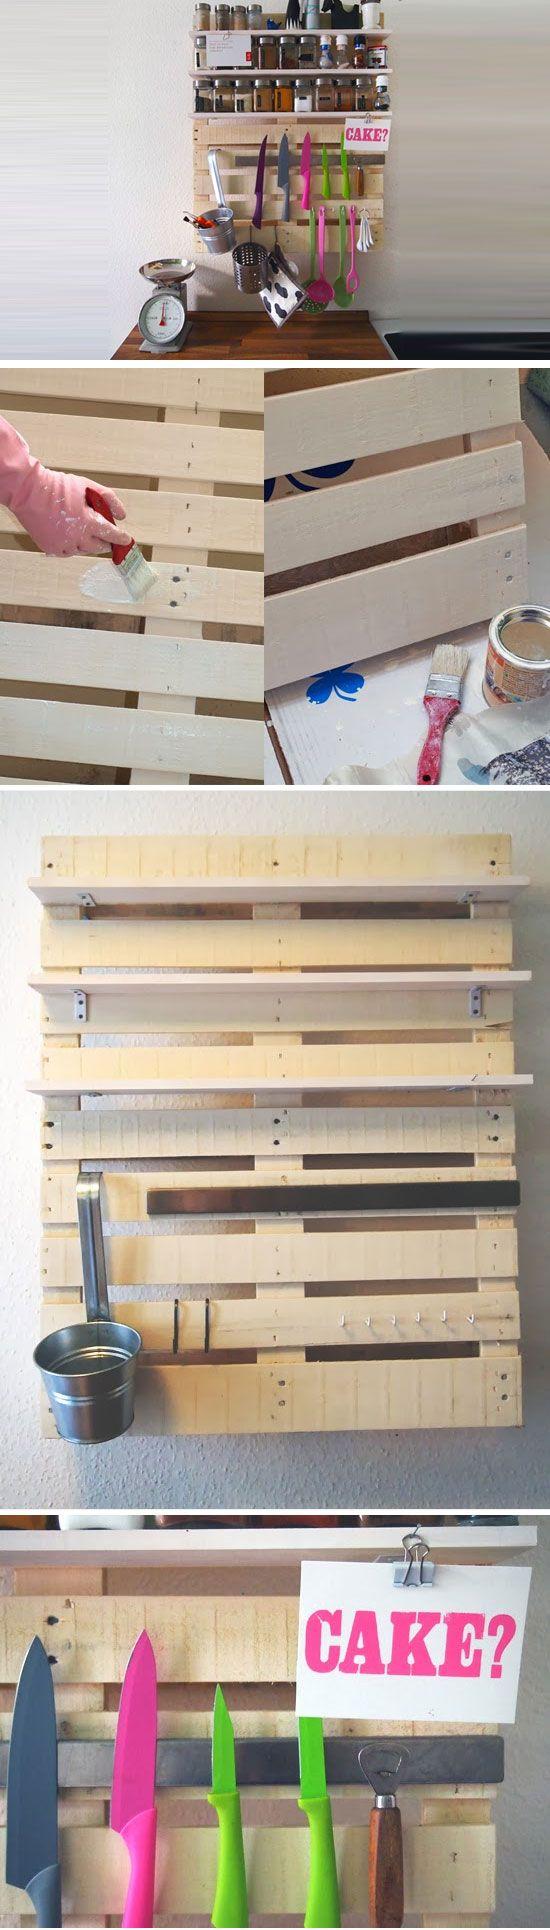 pallet shelf diy recycled storage ideas for food kitchen organization diy diy recycled on kitchen organization recycling id=38655